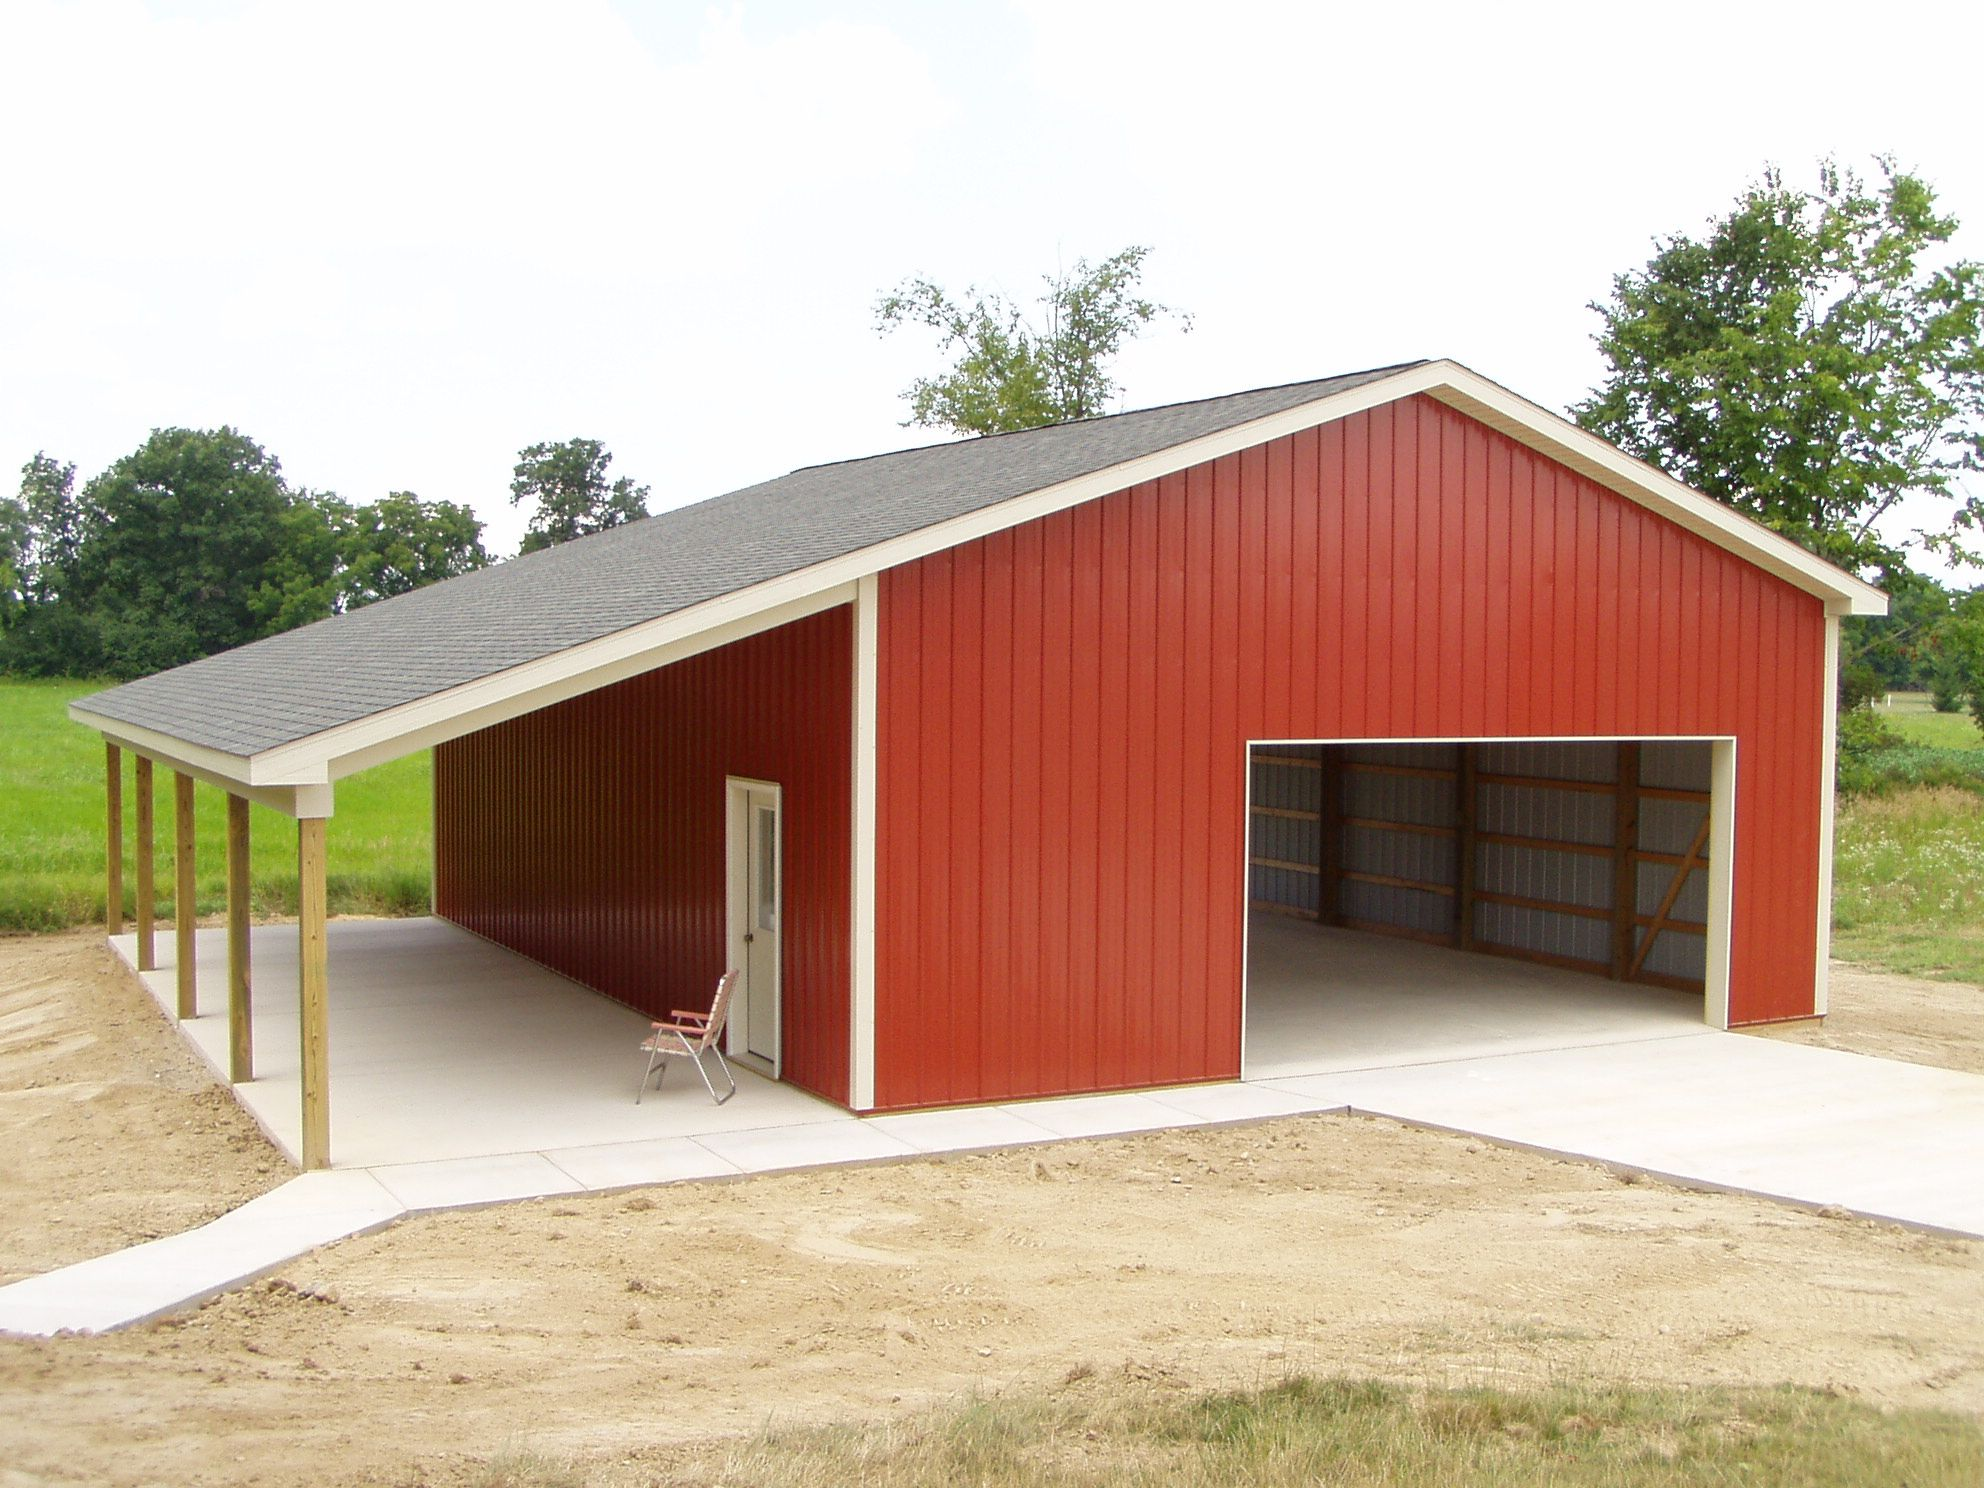 Burly oak builders 30 39 x 40 39 x 12 39 wall ht 12 39 lean to for Metal building ideas